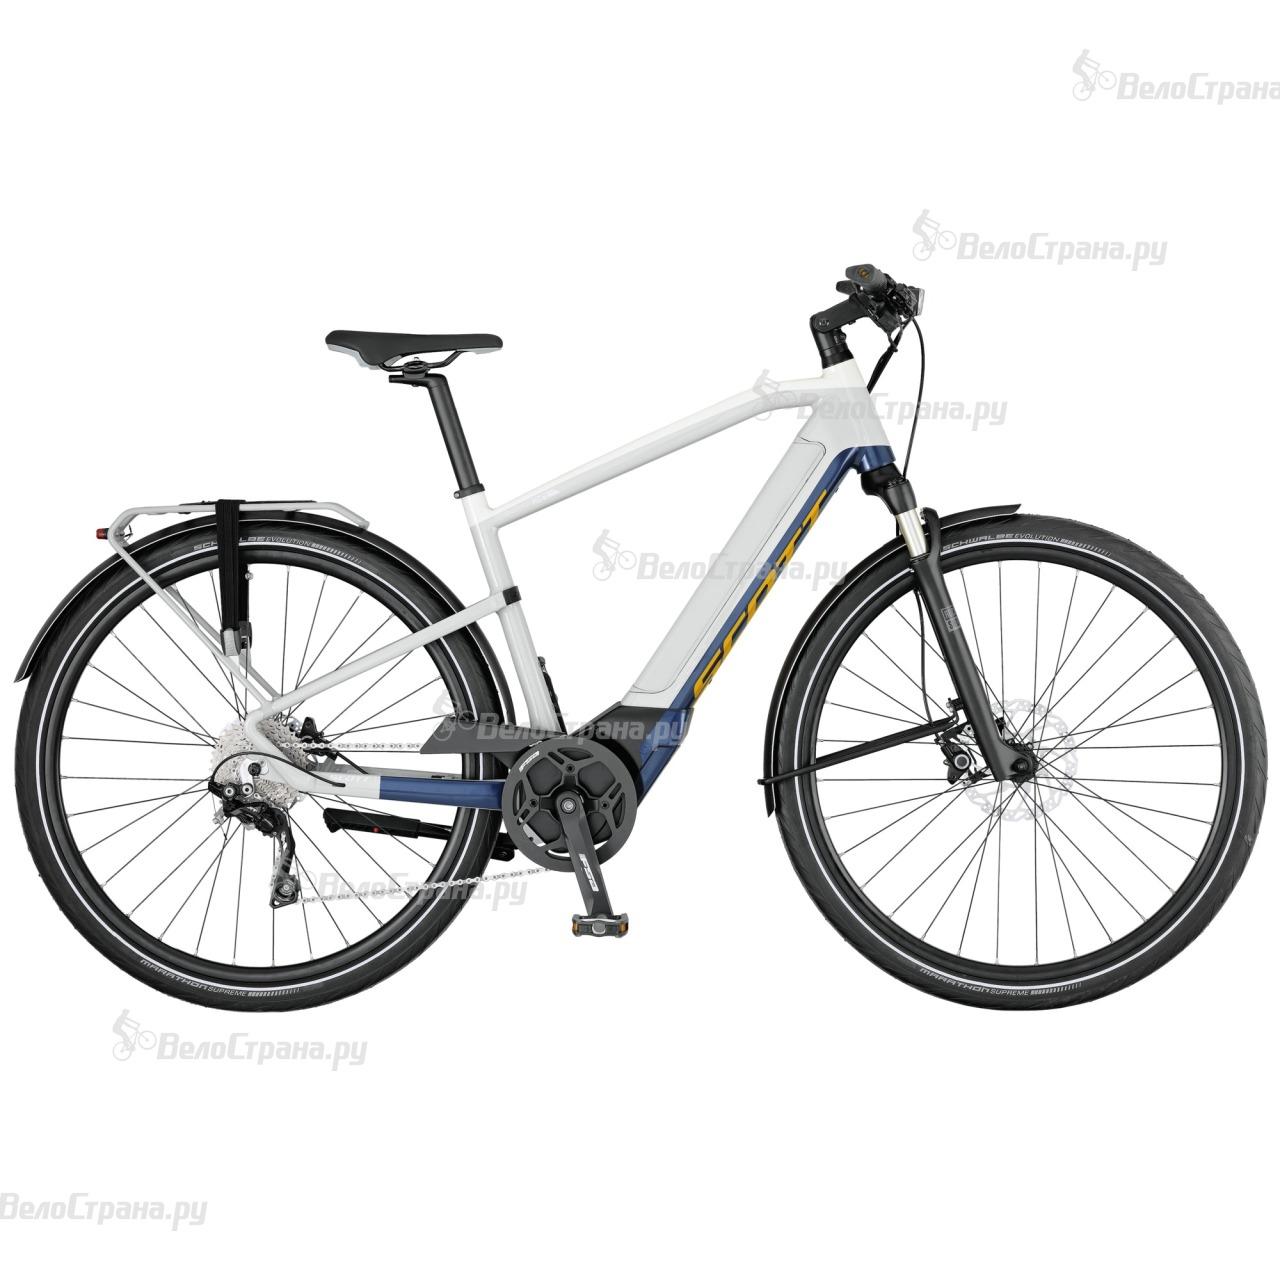 Велосипед Scott E-Silence 20 (2017) велосипед scott e silence evo 2017